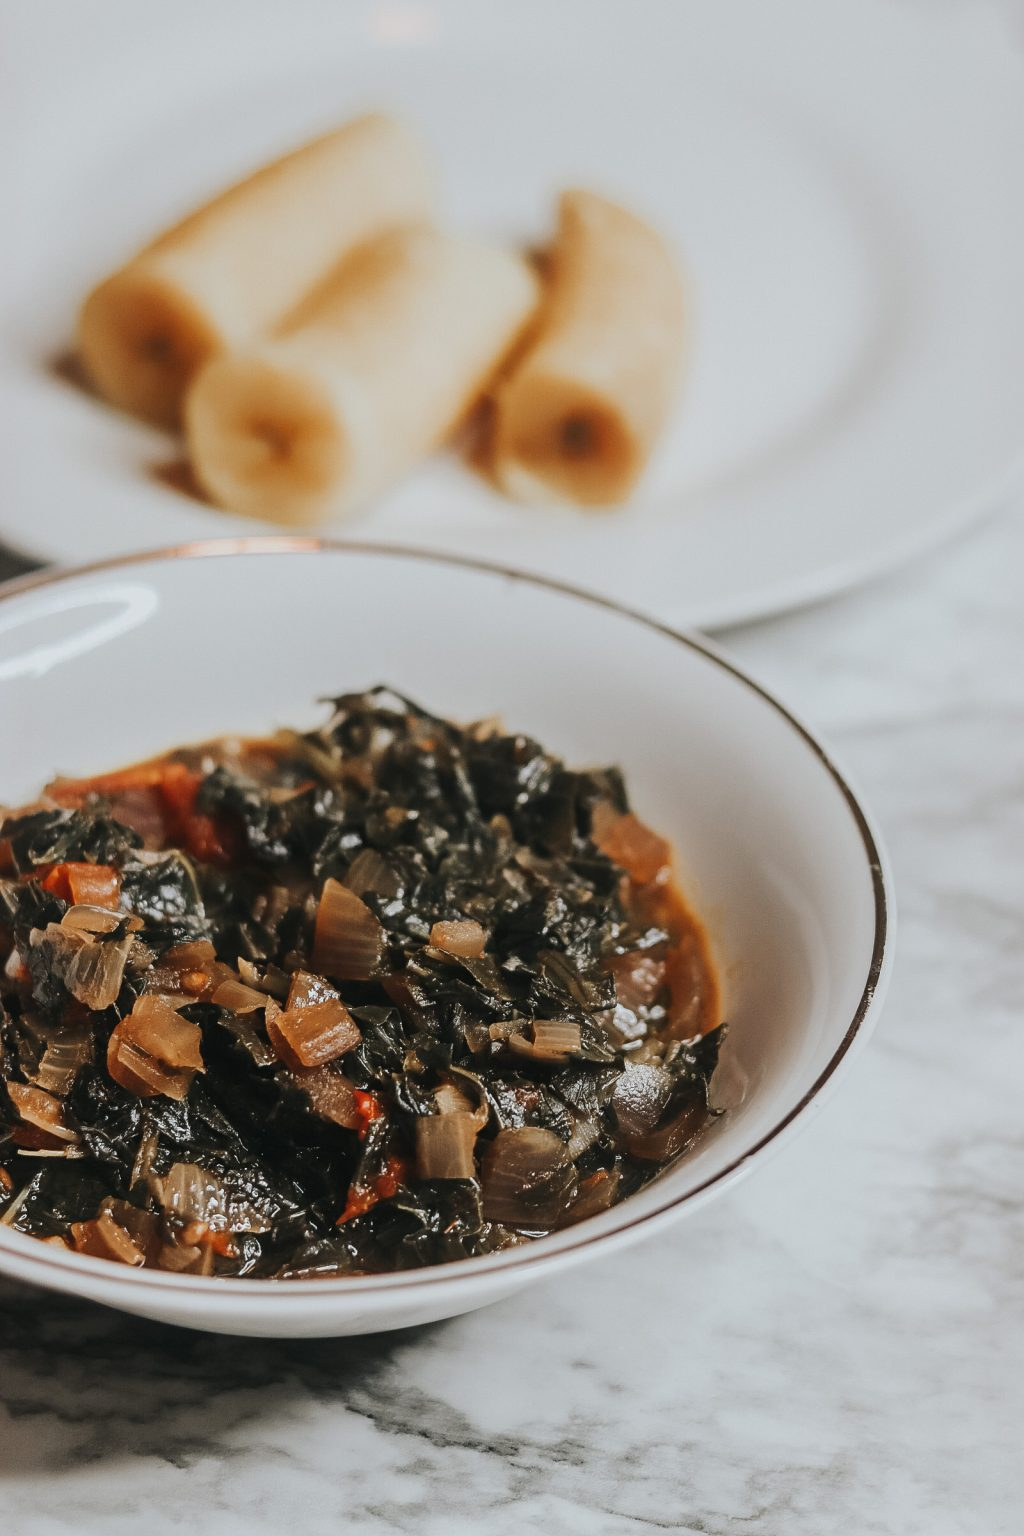 Vegan collard greens recipe